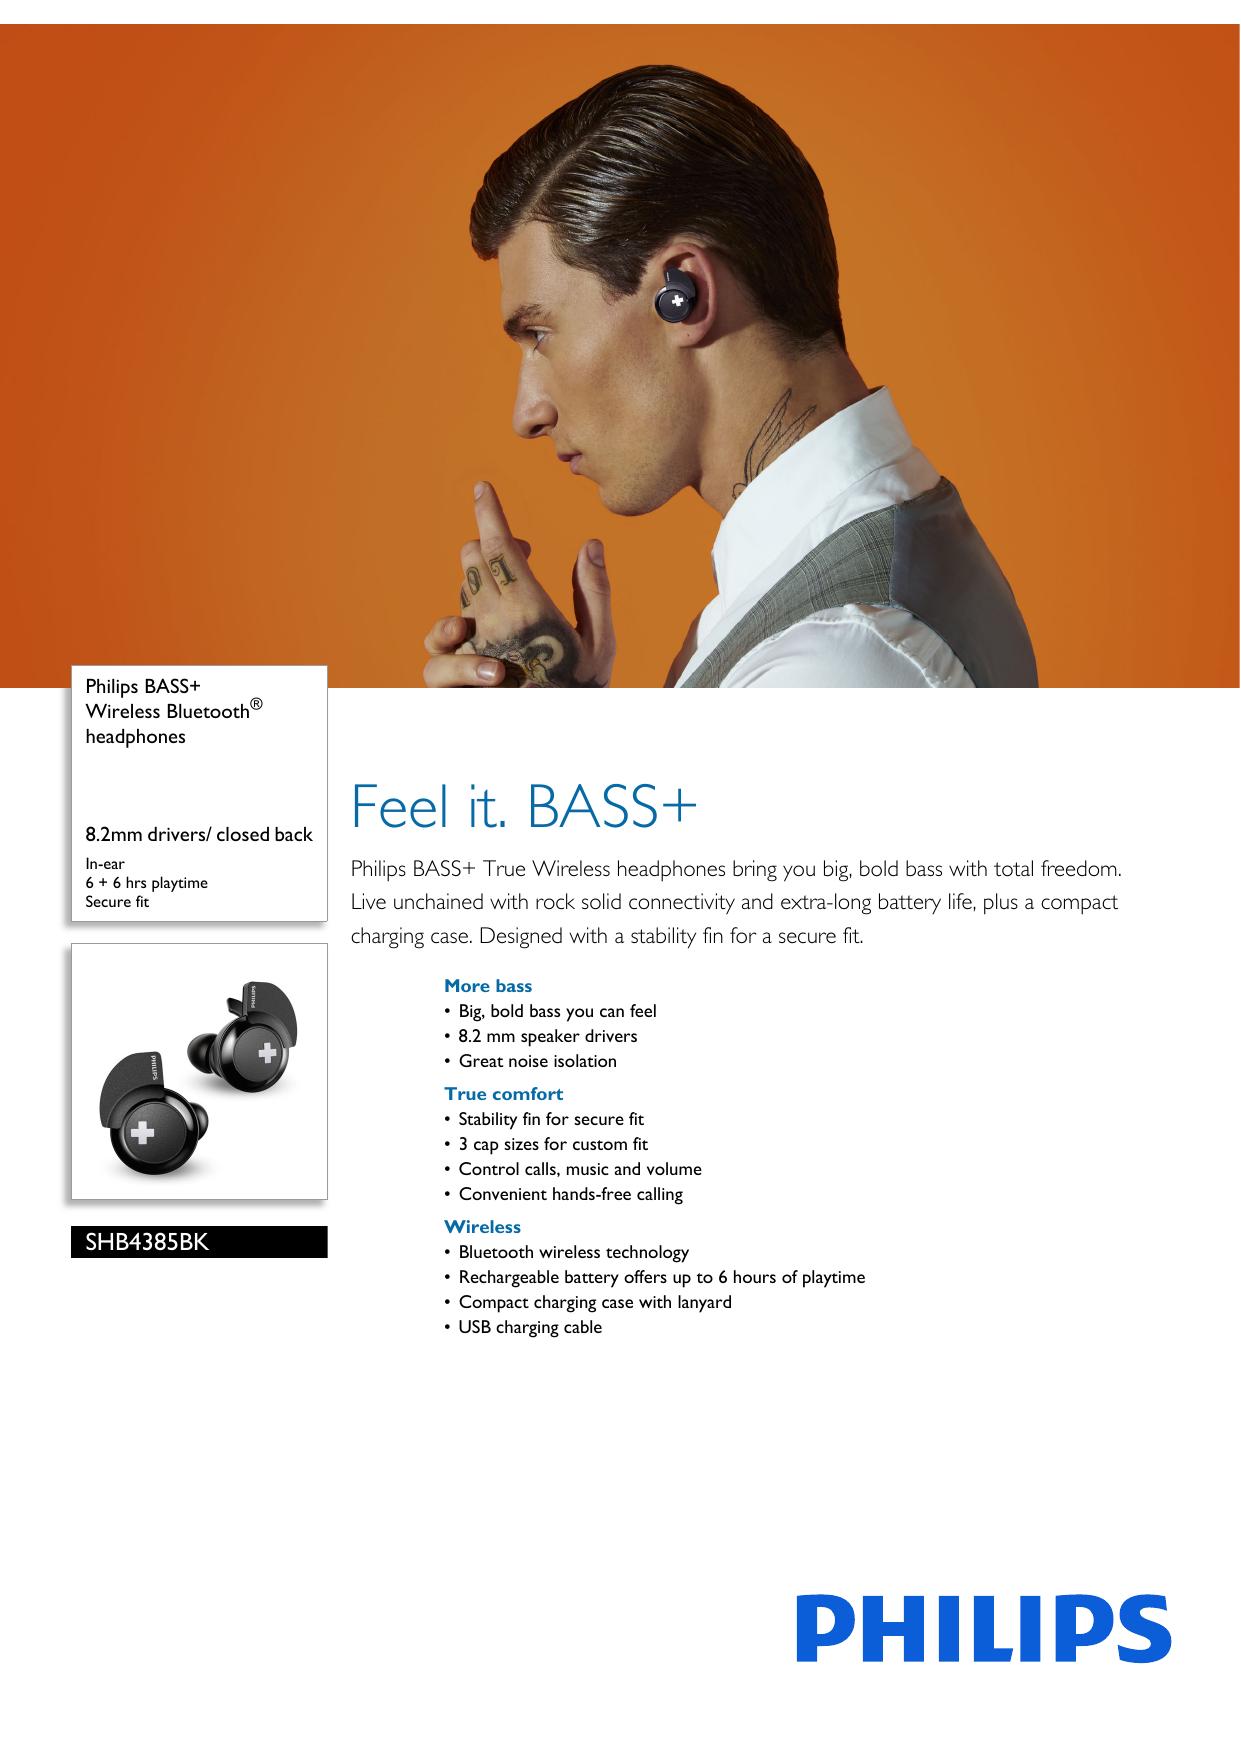 Shb4385bk 00 Philips Wireless Bluetooth Headphones Manualzz